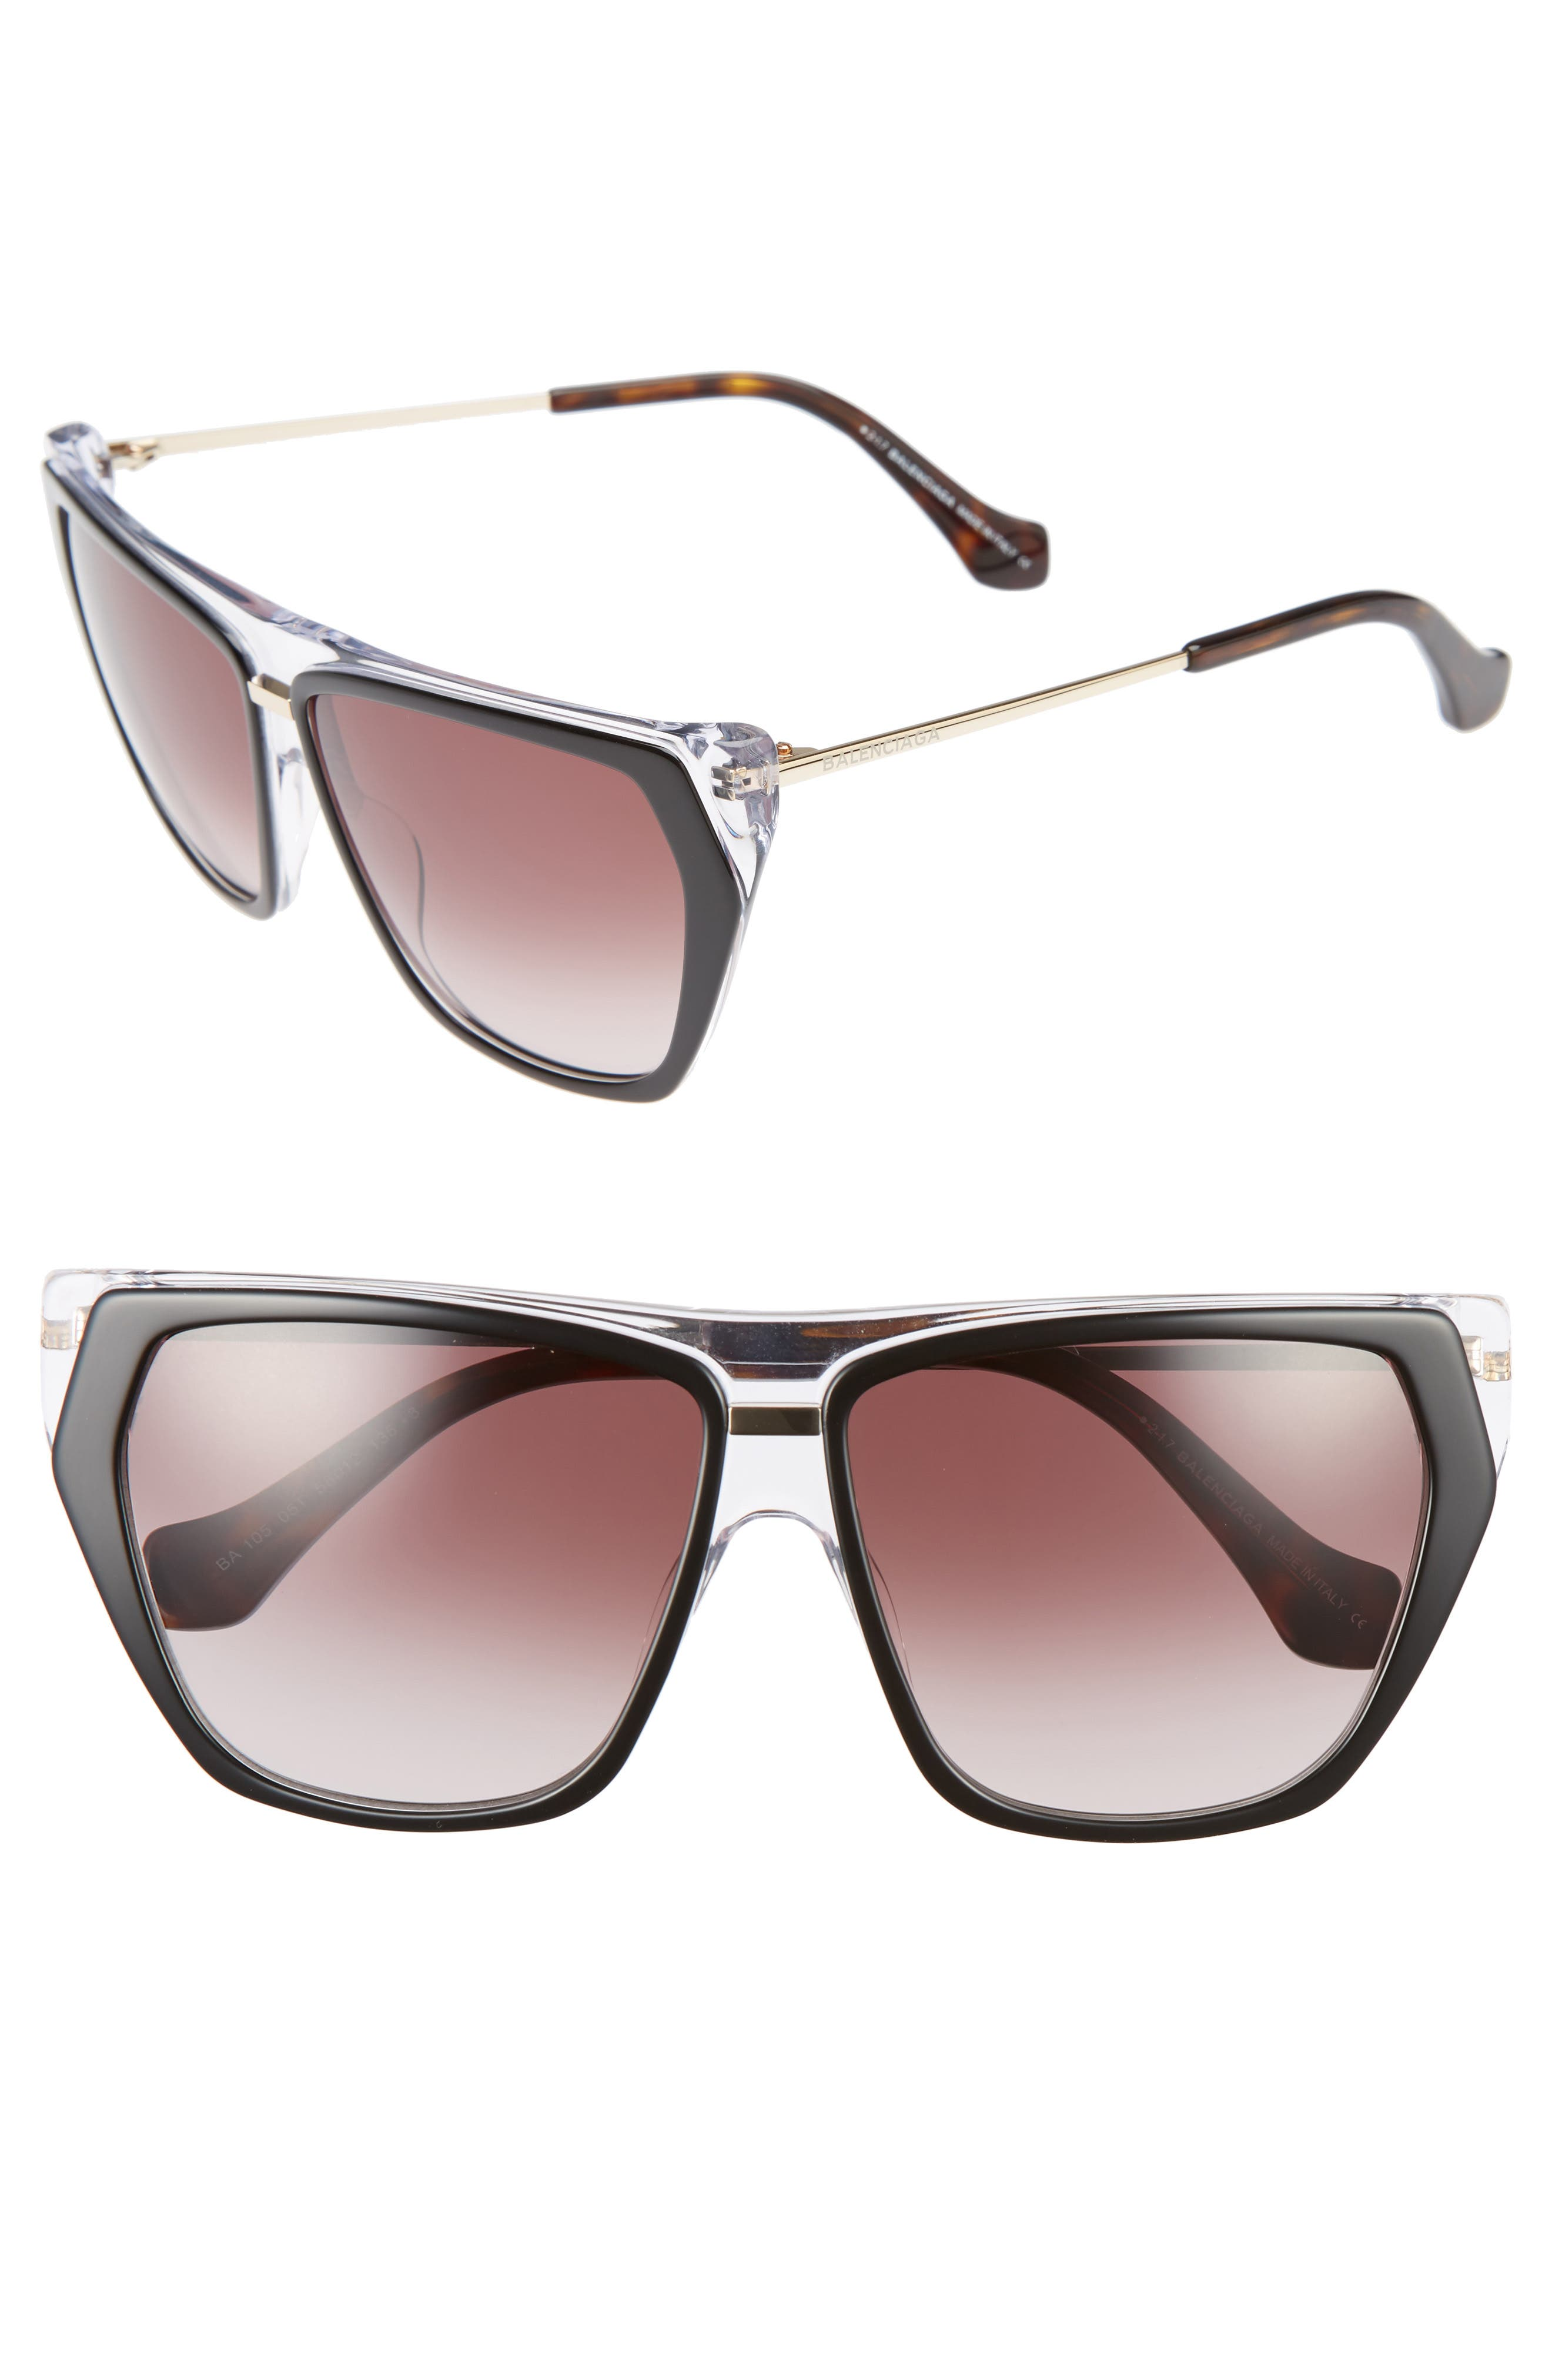 Alternate Image 1 Selected - Balenciaga 58mm Gradient Sunglasses